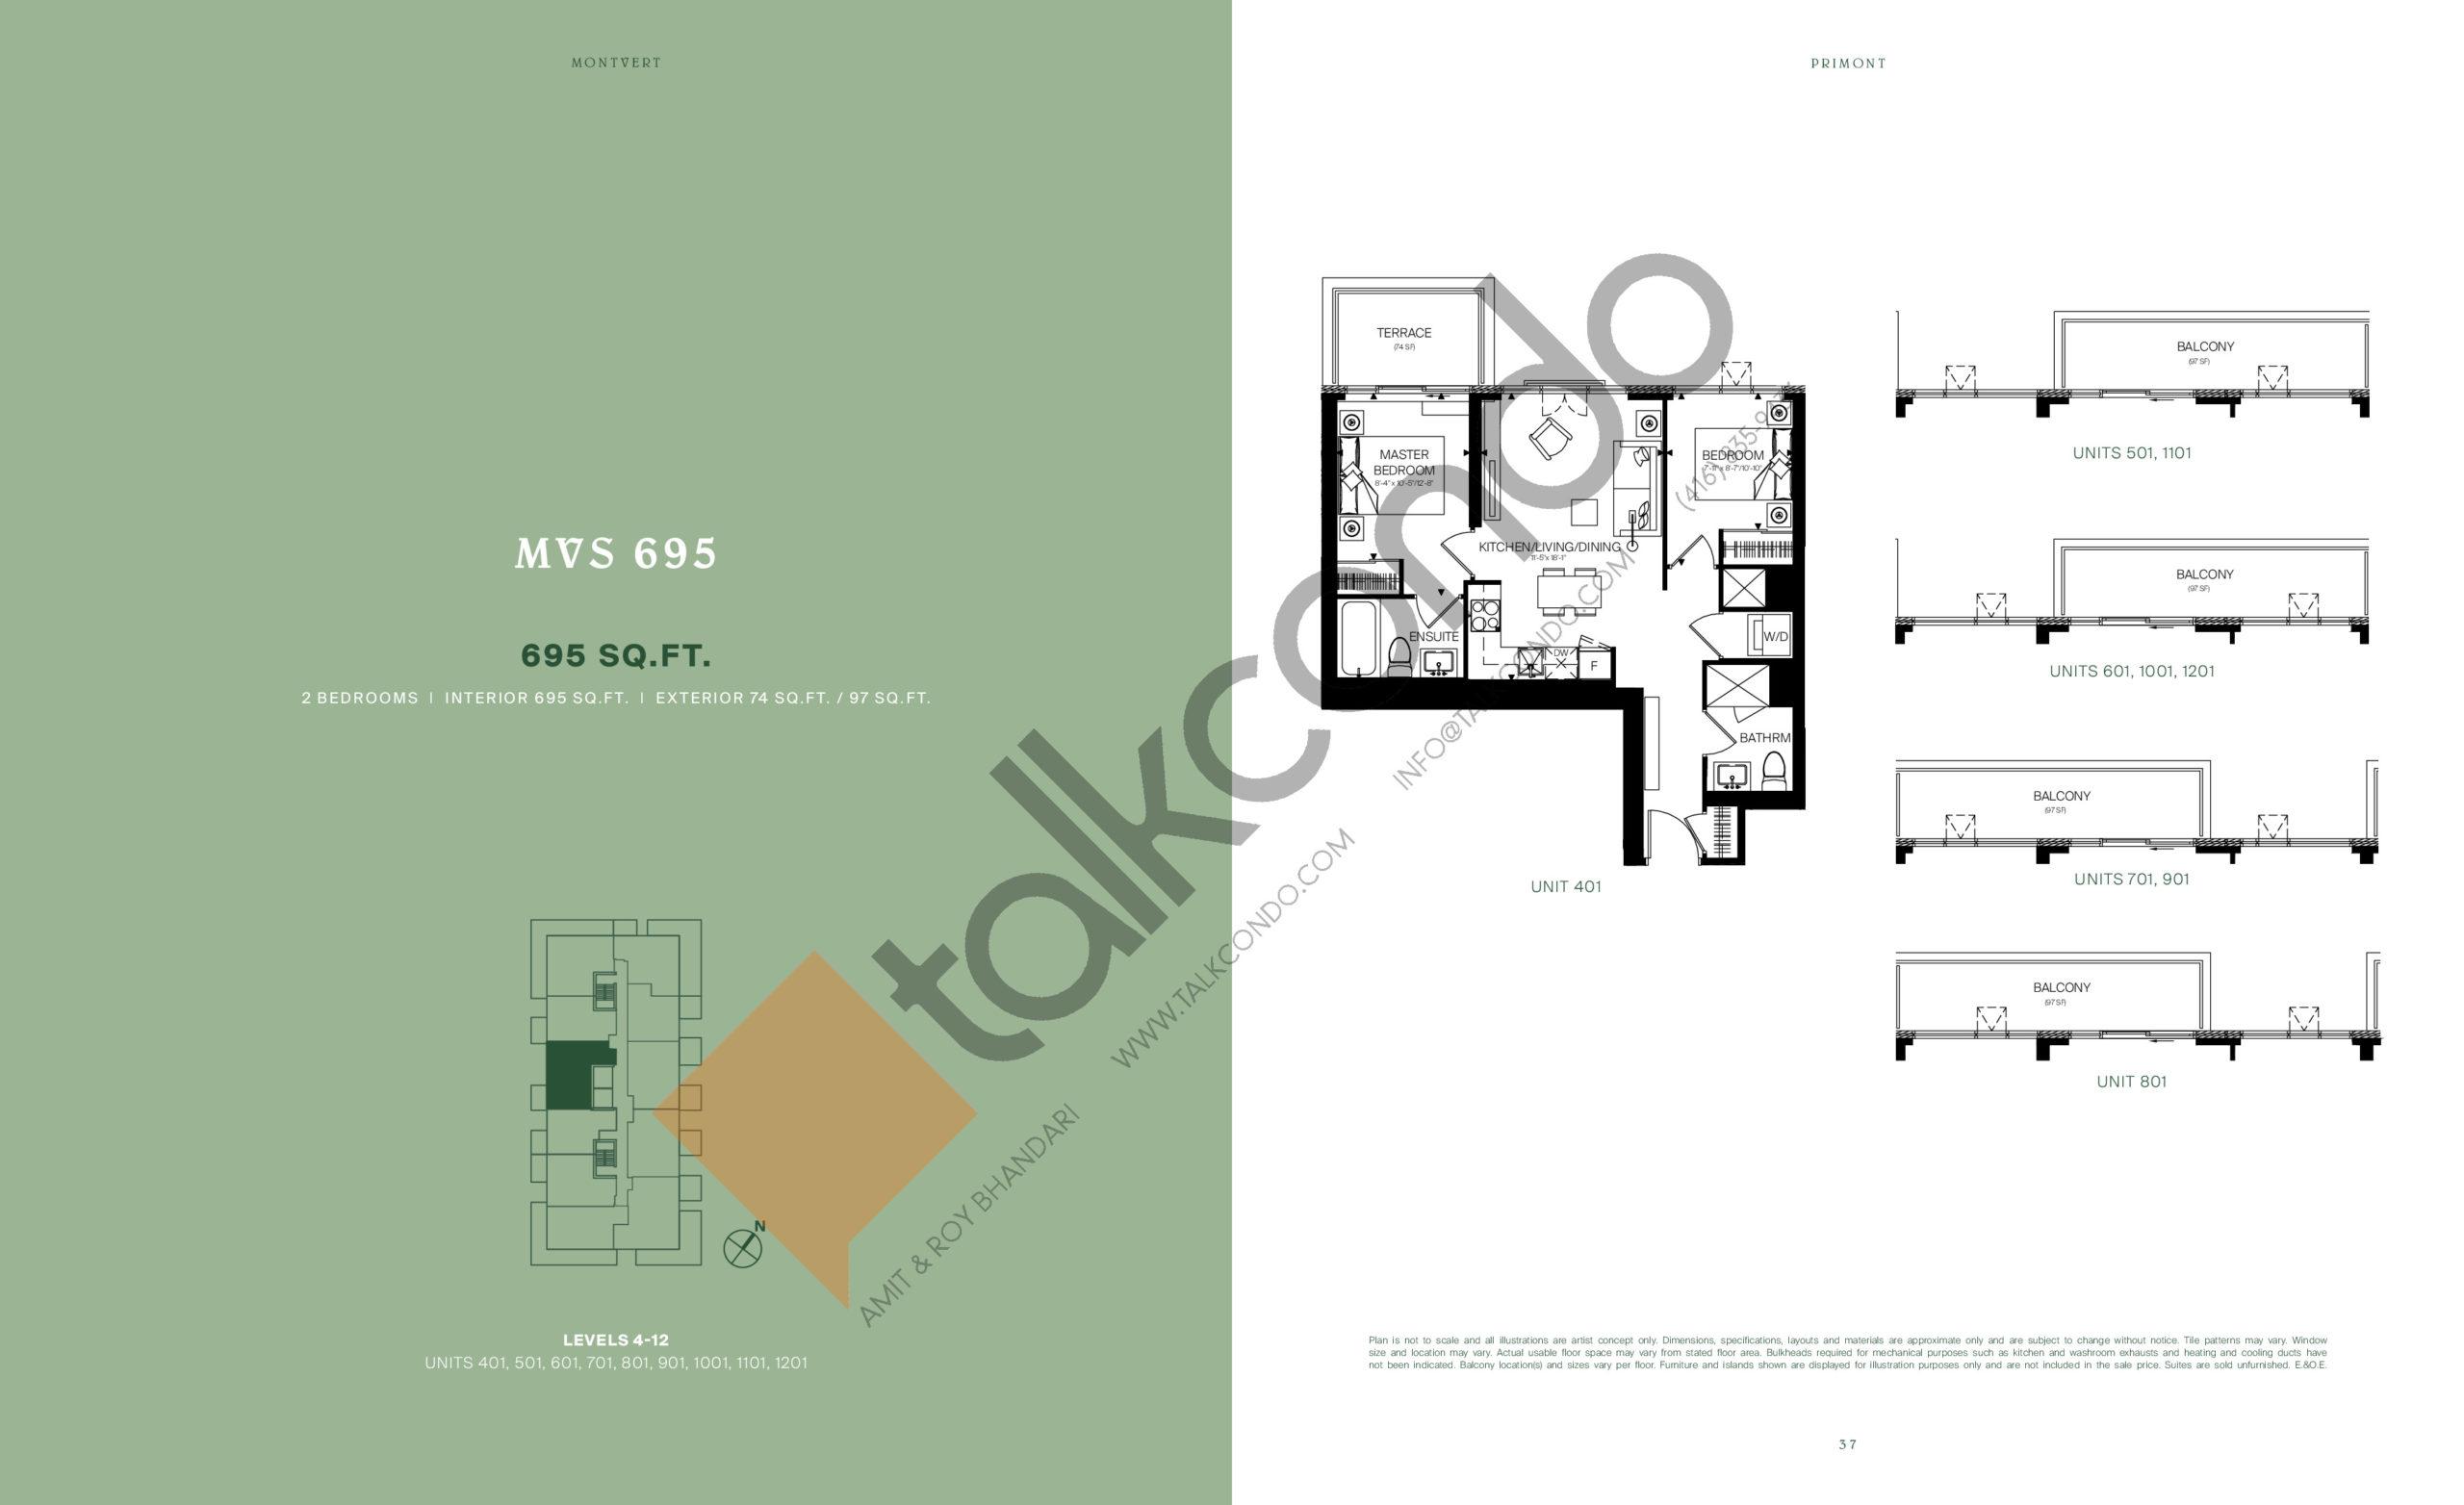 MVS 695 Floor Plan at MontVert Condos - 695 sq.ft